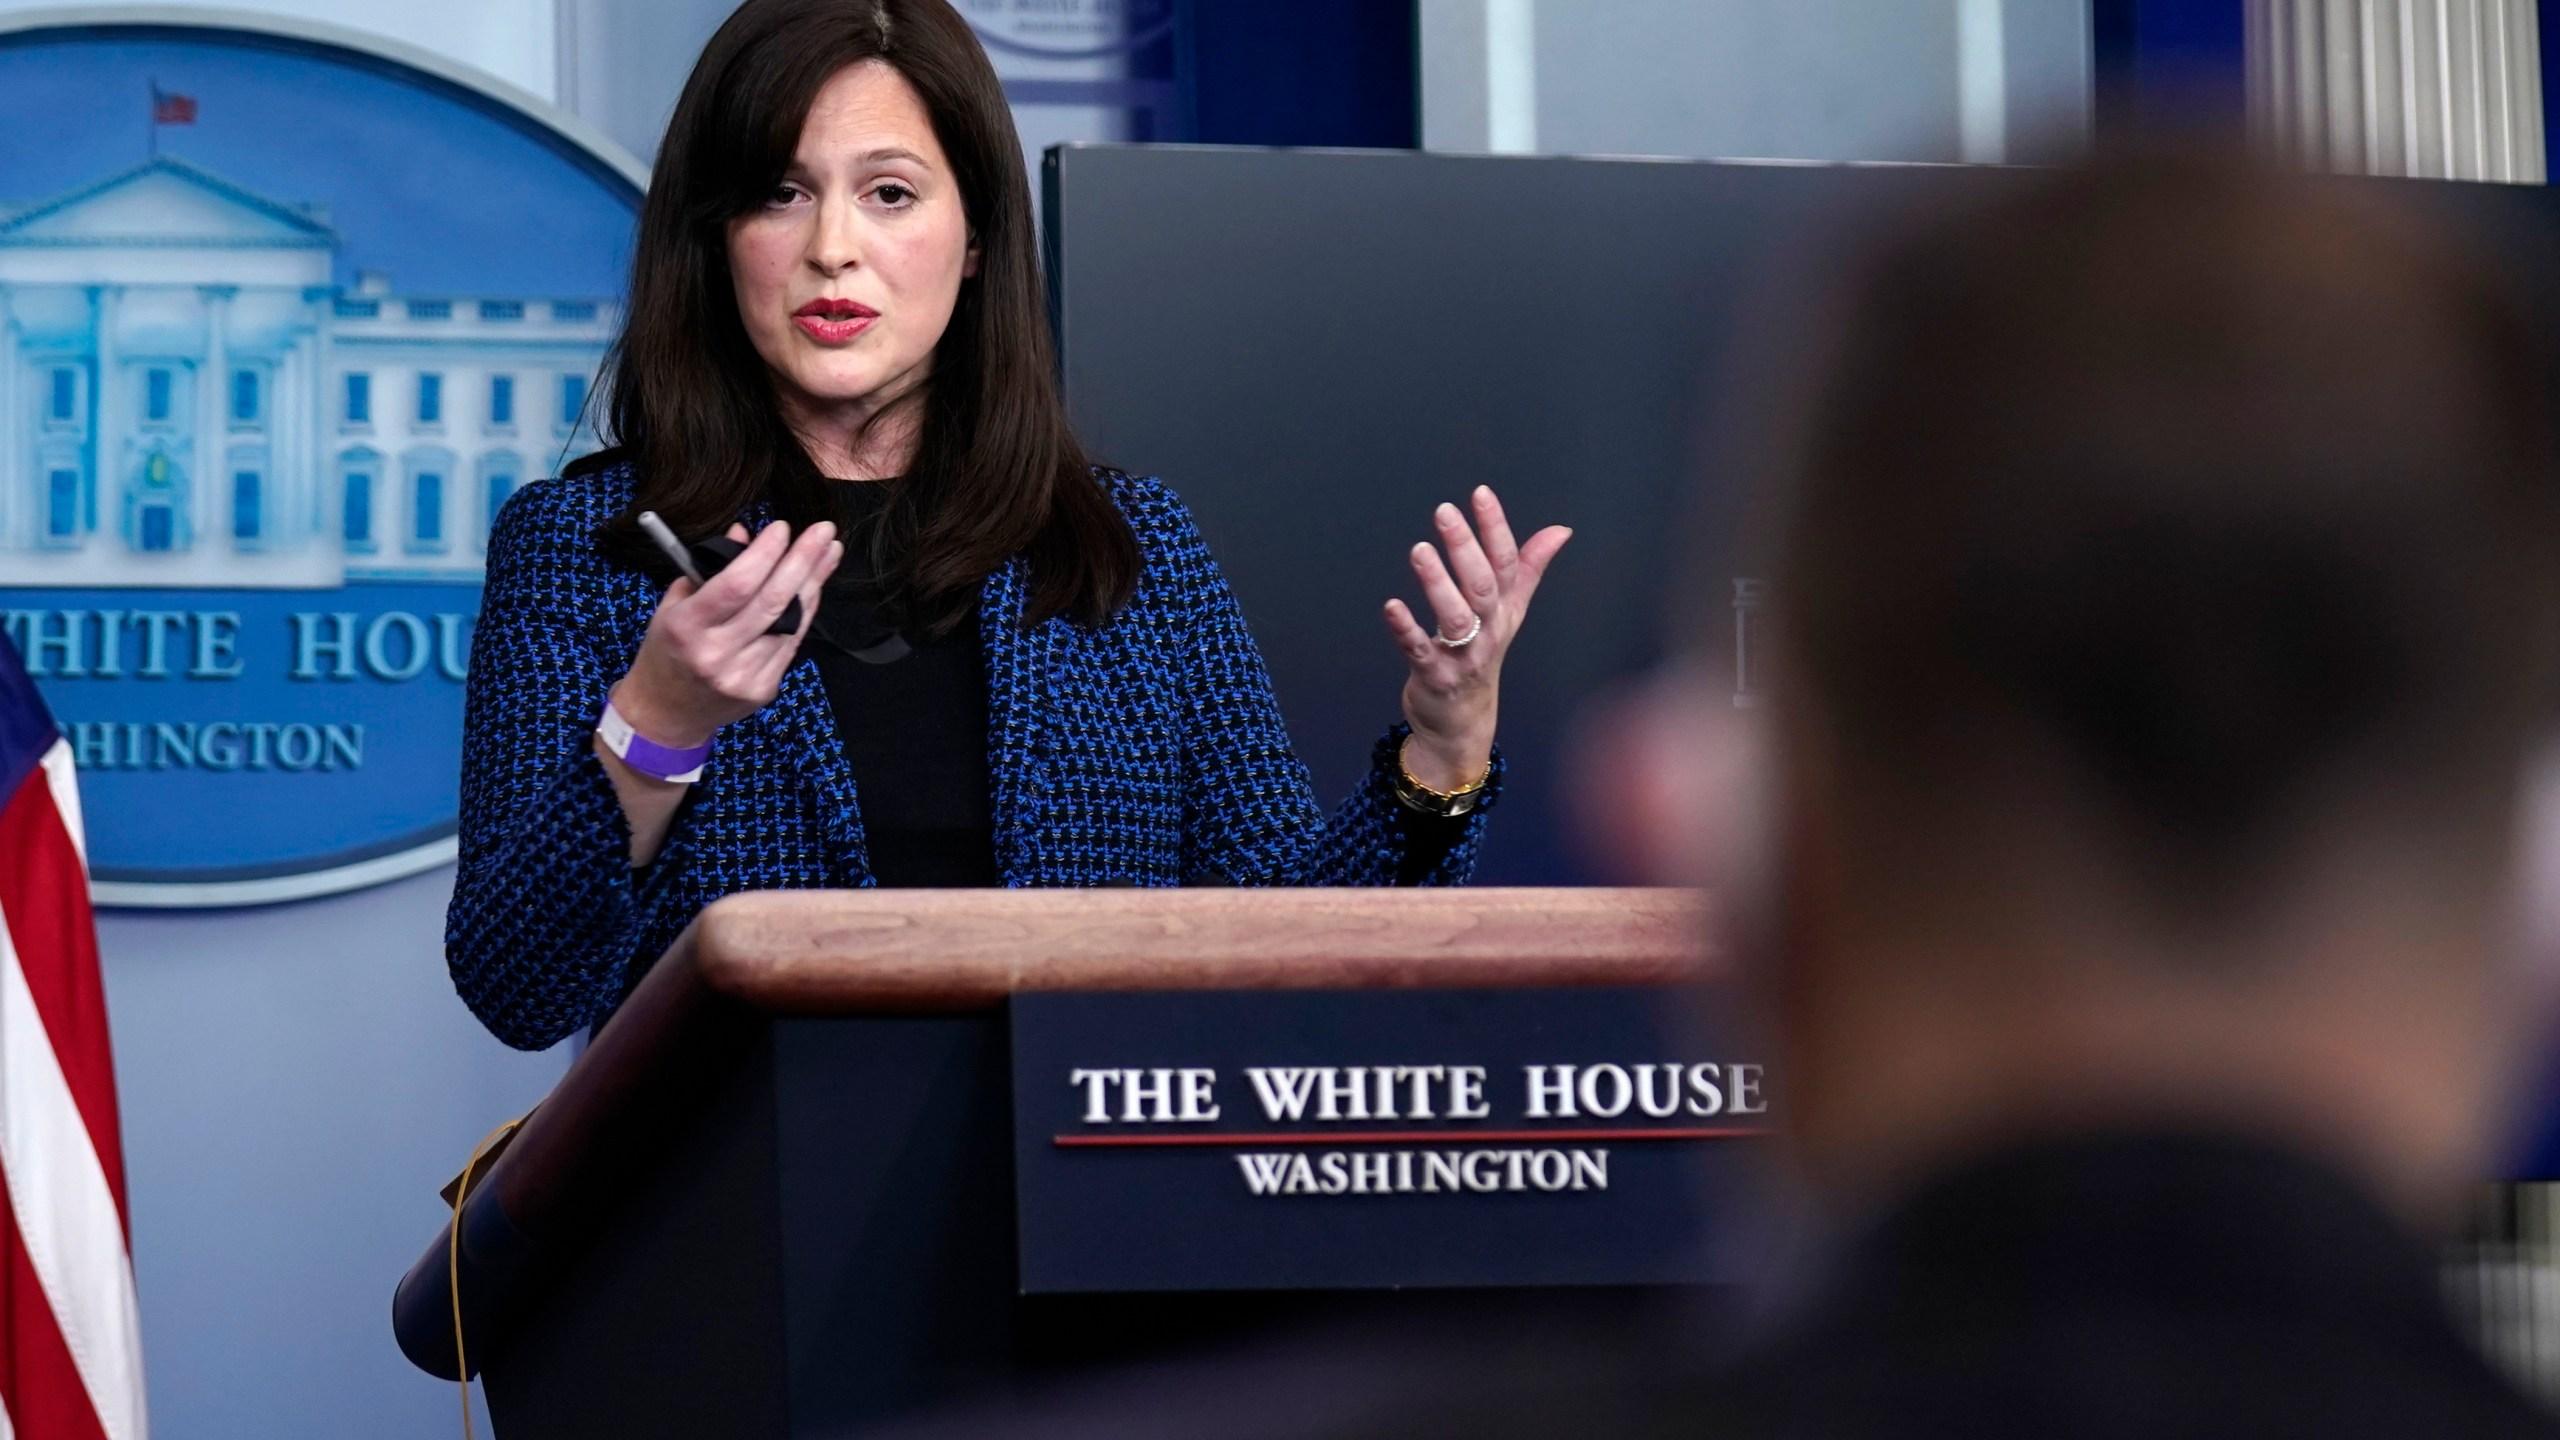 White House deputy national security adviser Anne Neuberger speaks during a press briefing on Feb. 17, 2021, in Washington. (AP Photo/Evan Vucci)